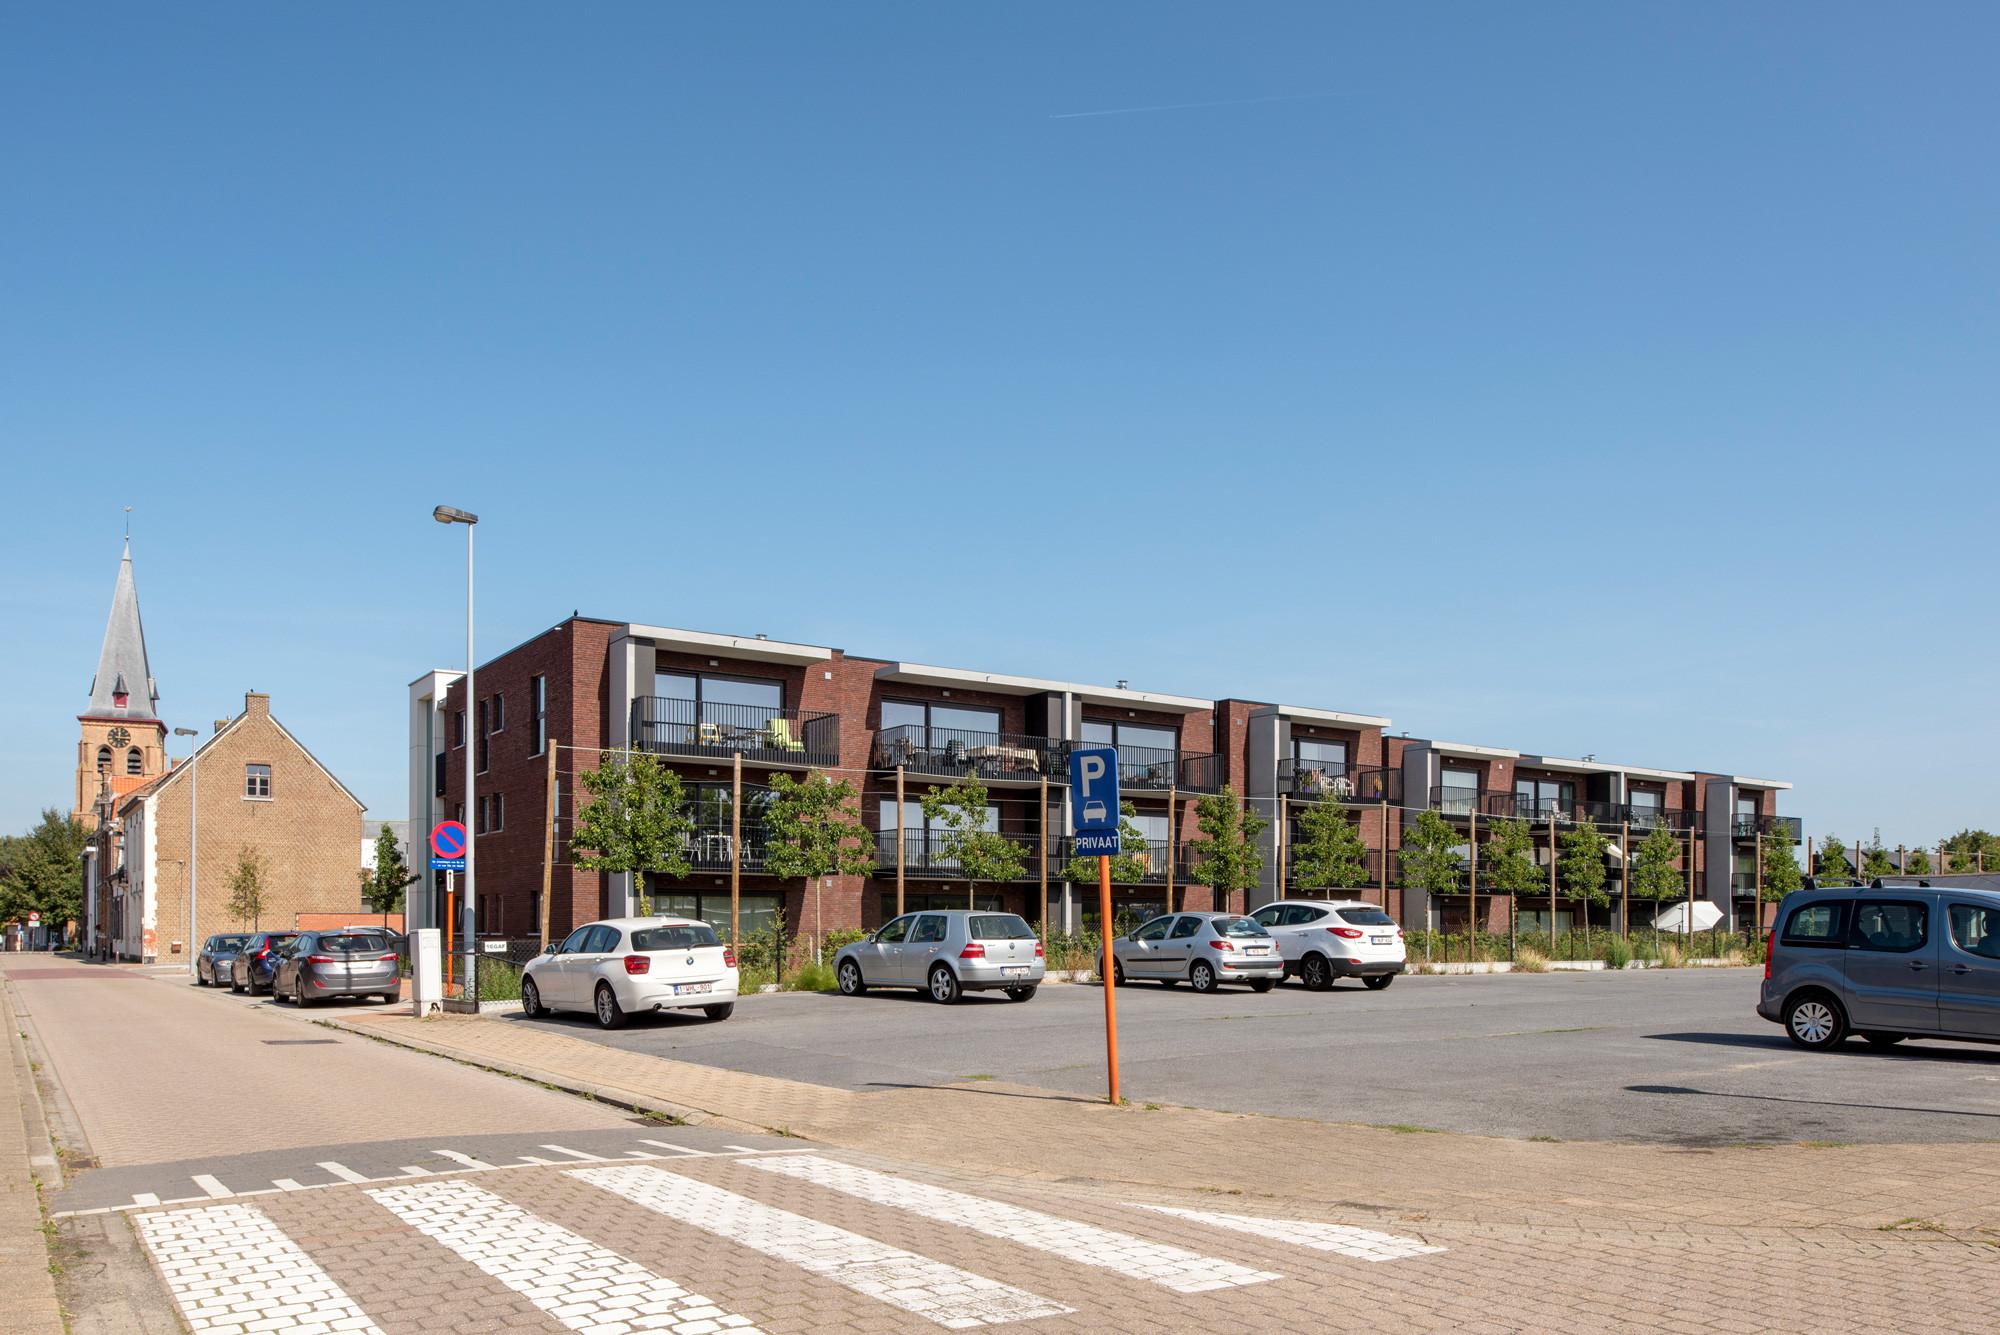 Meergezinswoning-Beernem-Claeys Architecten.jpg